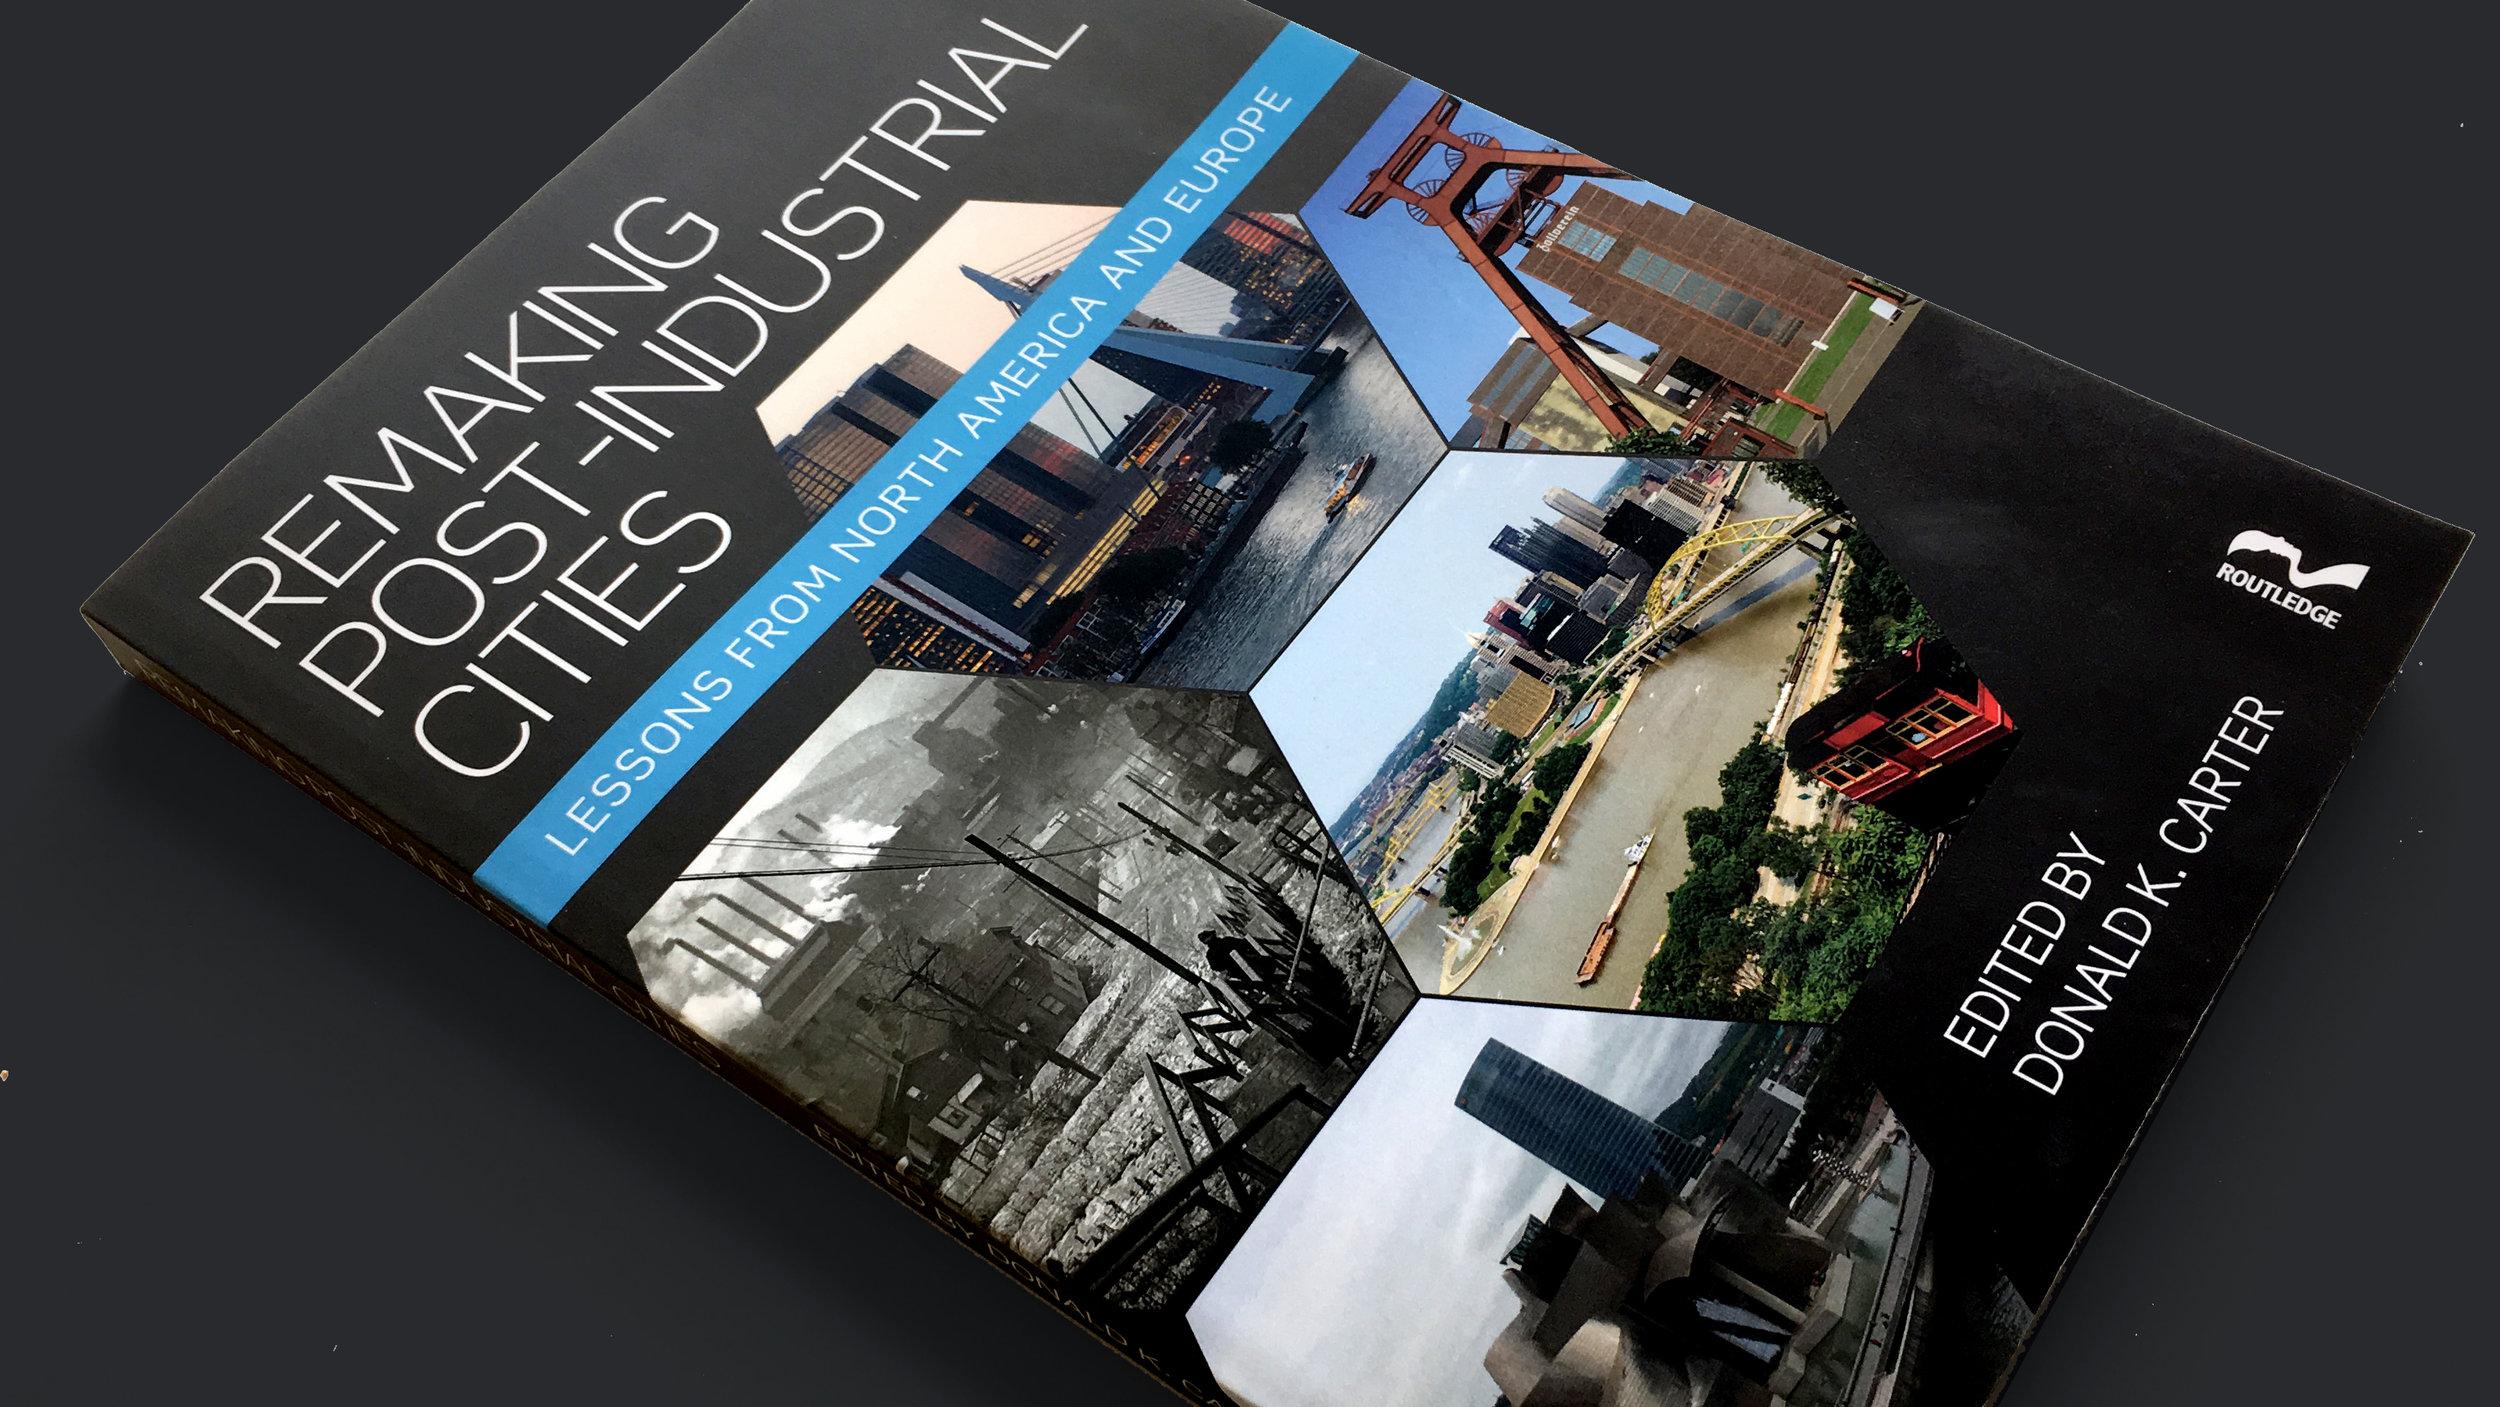 22_MUD_WORK19_Remaking Post-Industrial Cities publication by professor Donald K. Carter.jpg